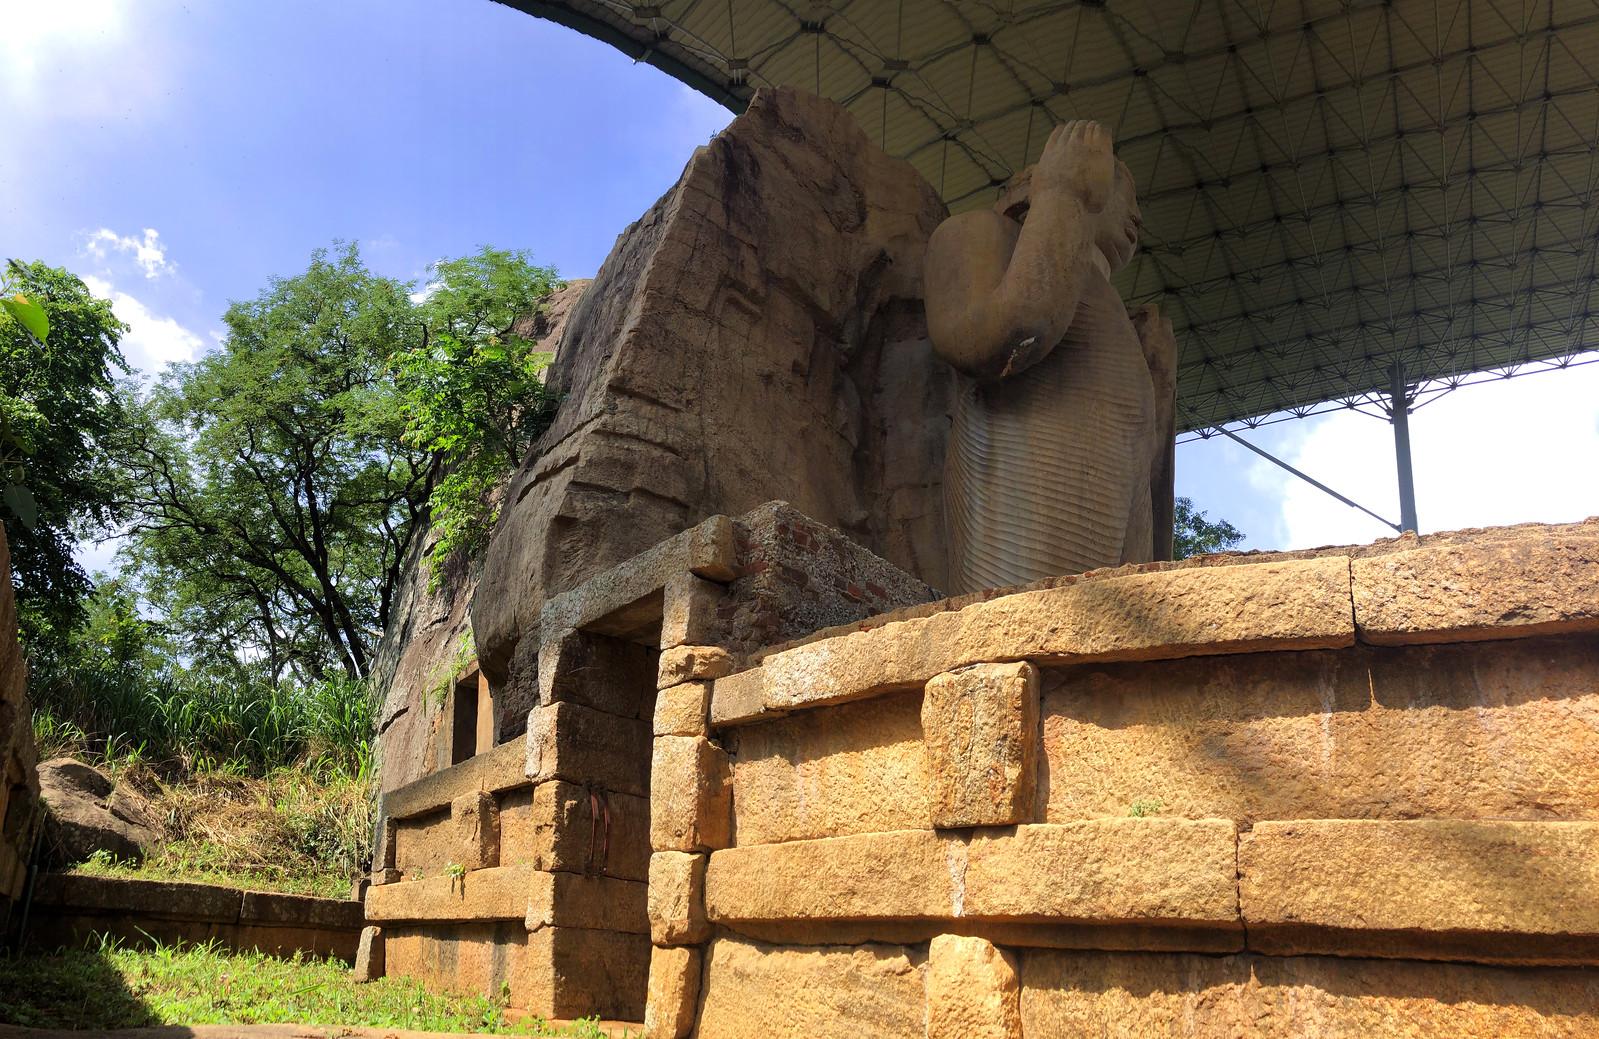 Aukana, la estatua de Buda más alta de Sri Lanka buda de aukana - 46728899952 59b59fa22d h - Buda de Aukana, la estatua de Buda más alta de Sri Lanka